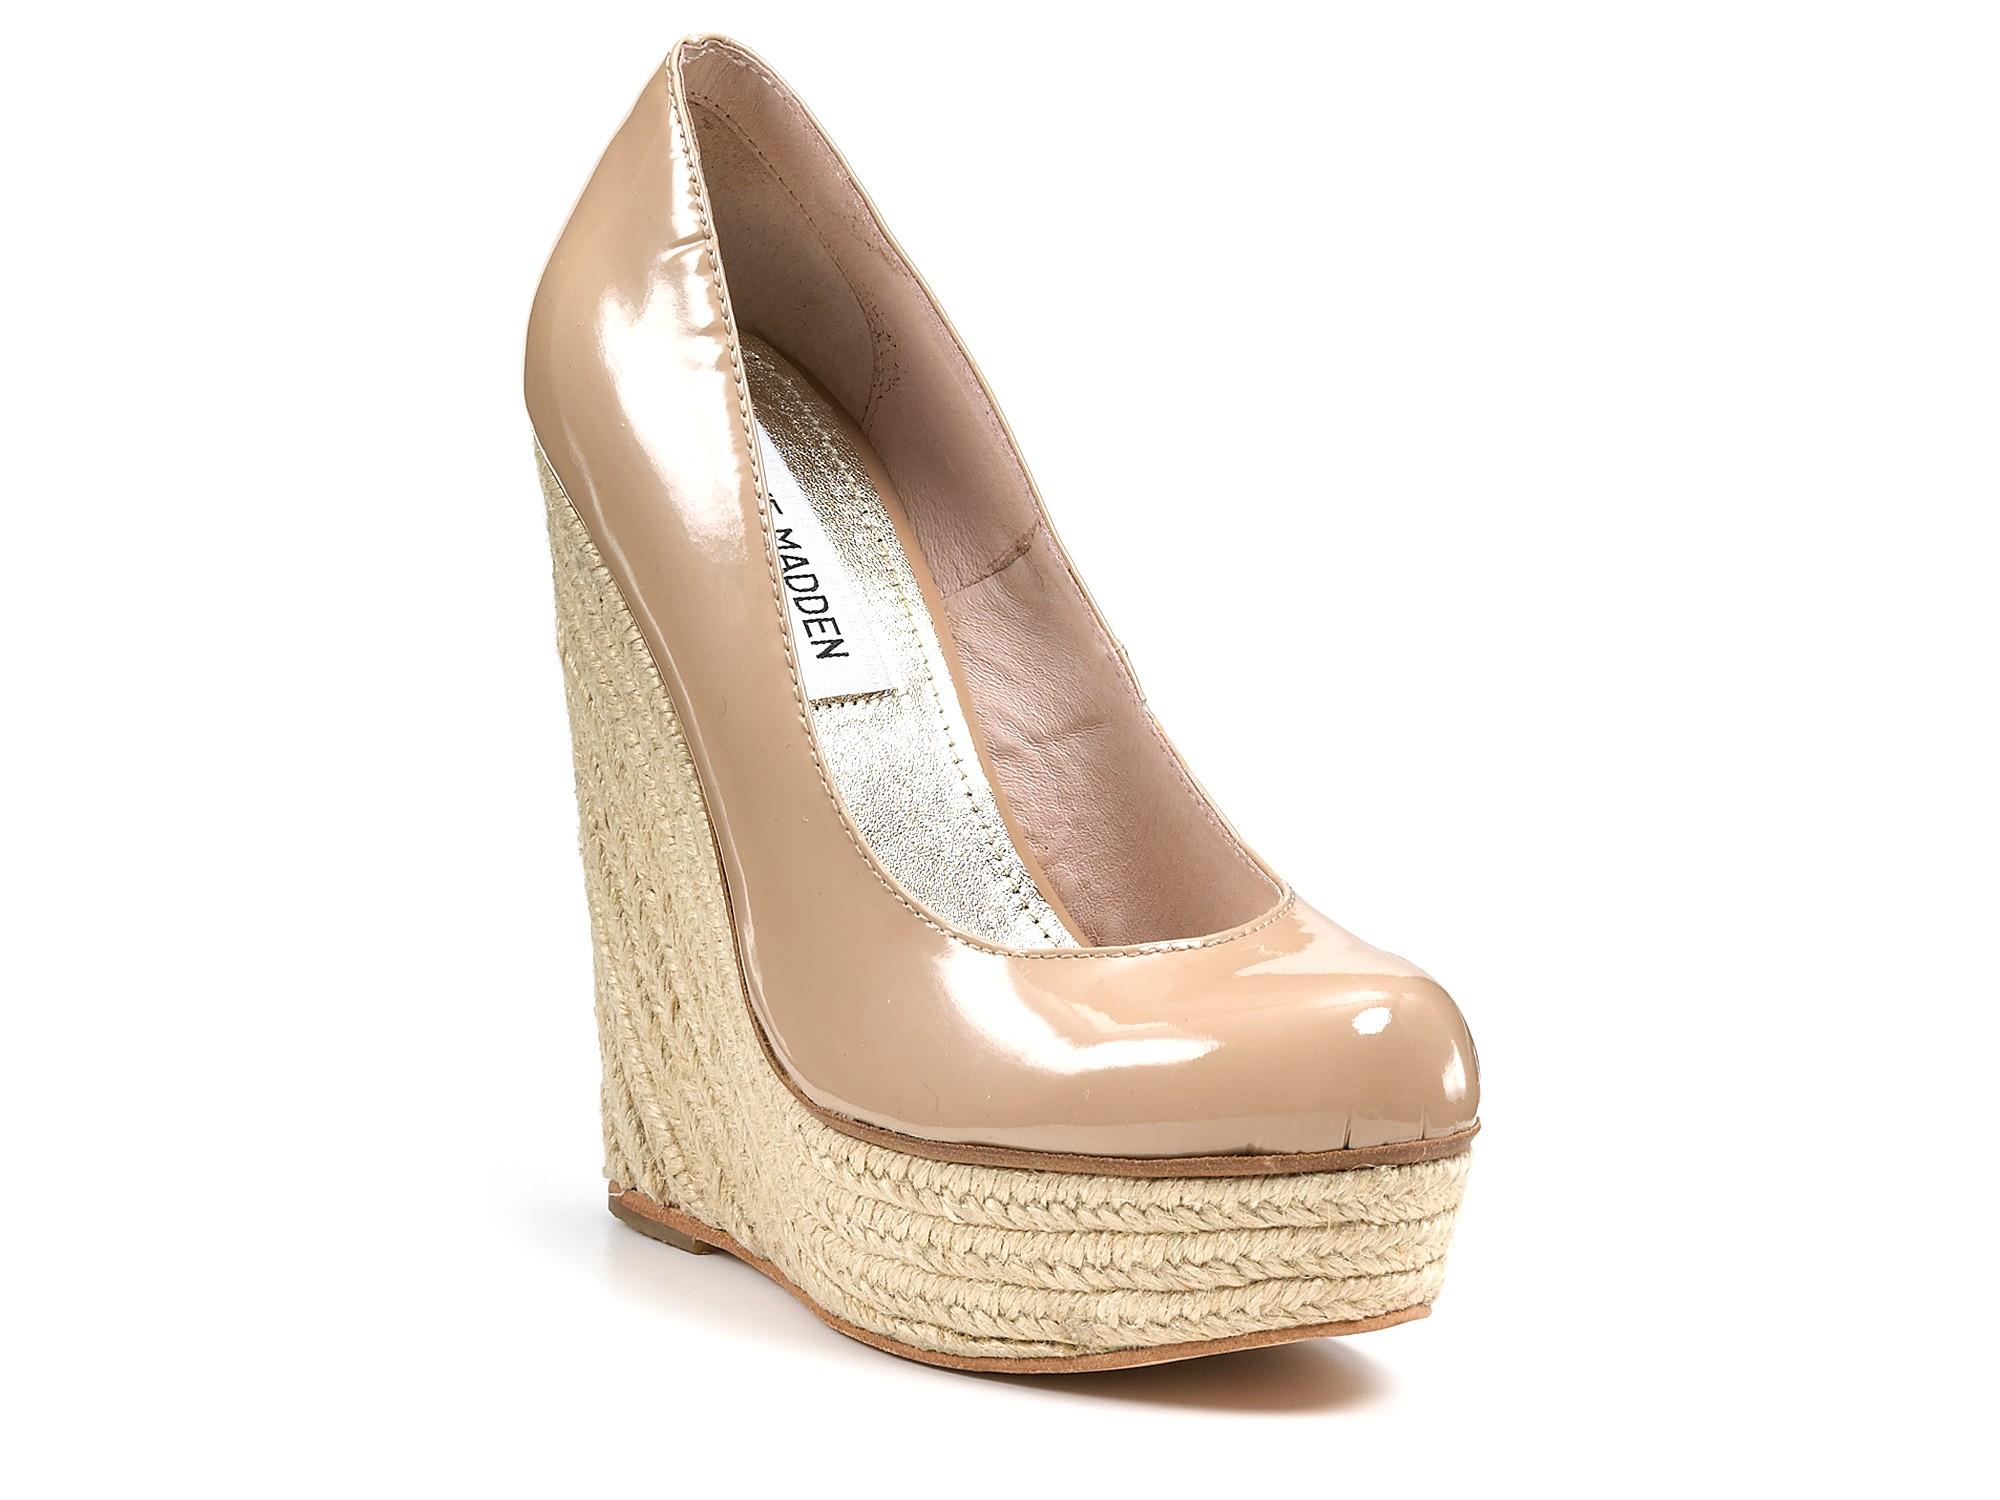 Benjamin Adams Shoes Sizing Guide